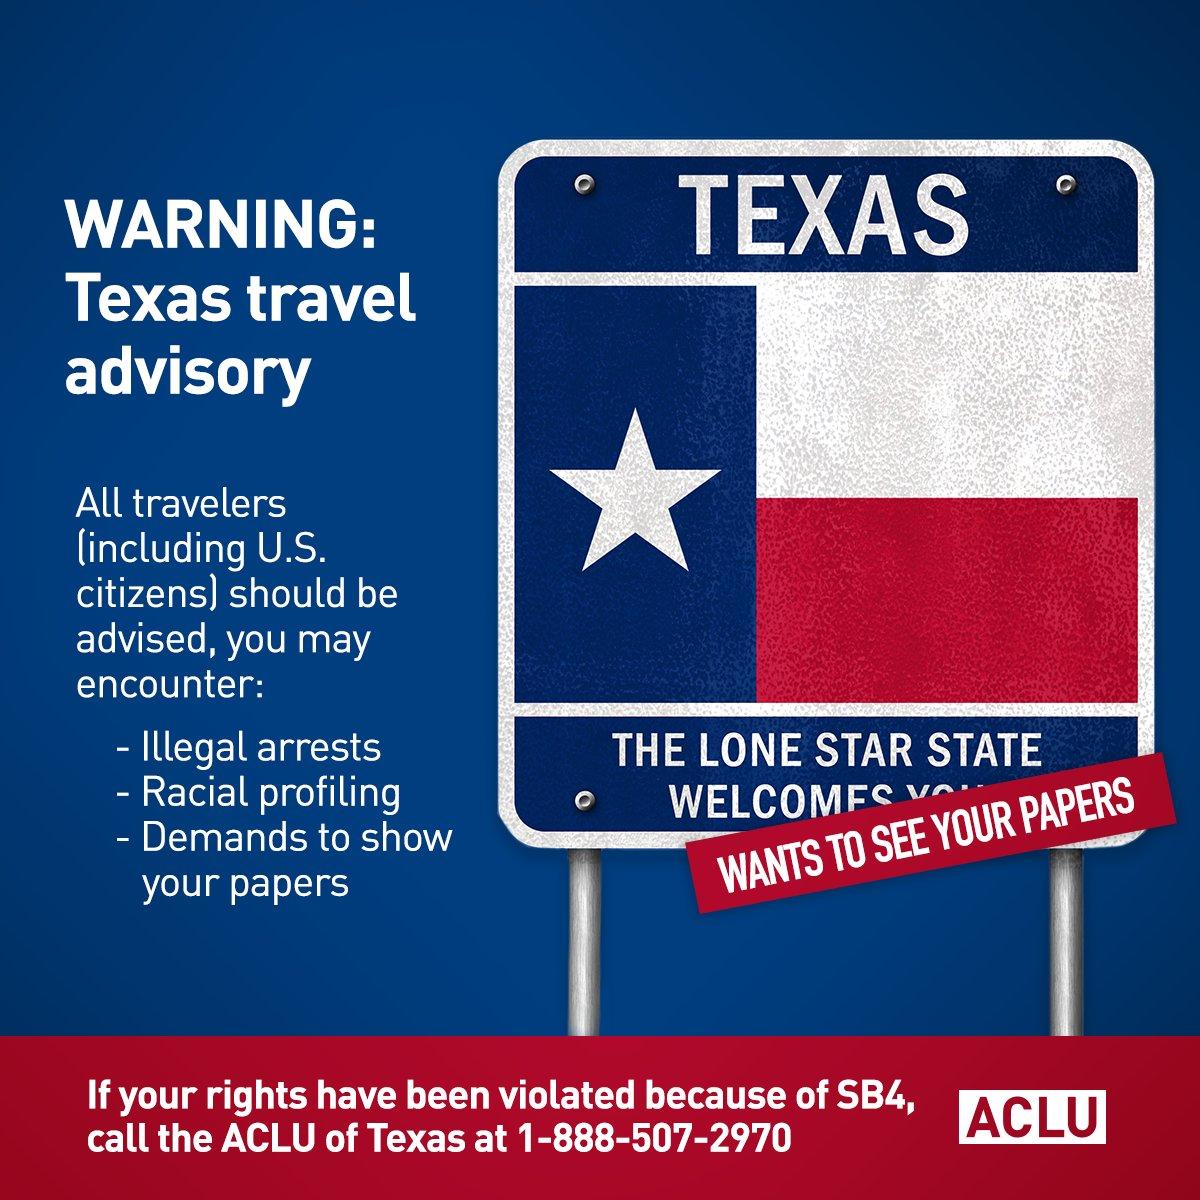 sb4_ACLU-twitter.jpg-large